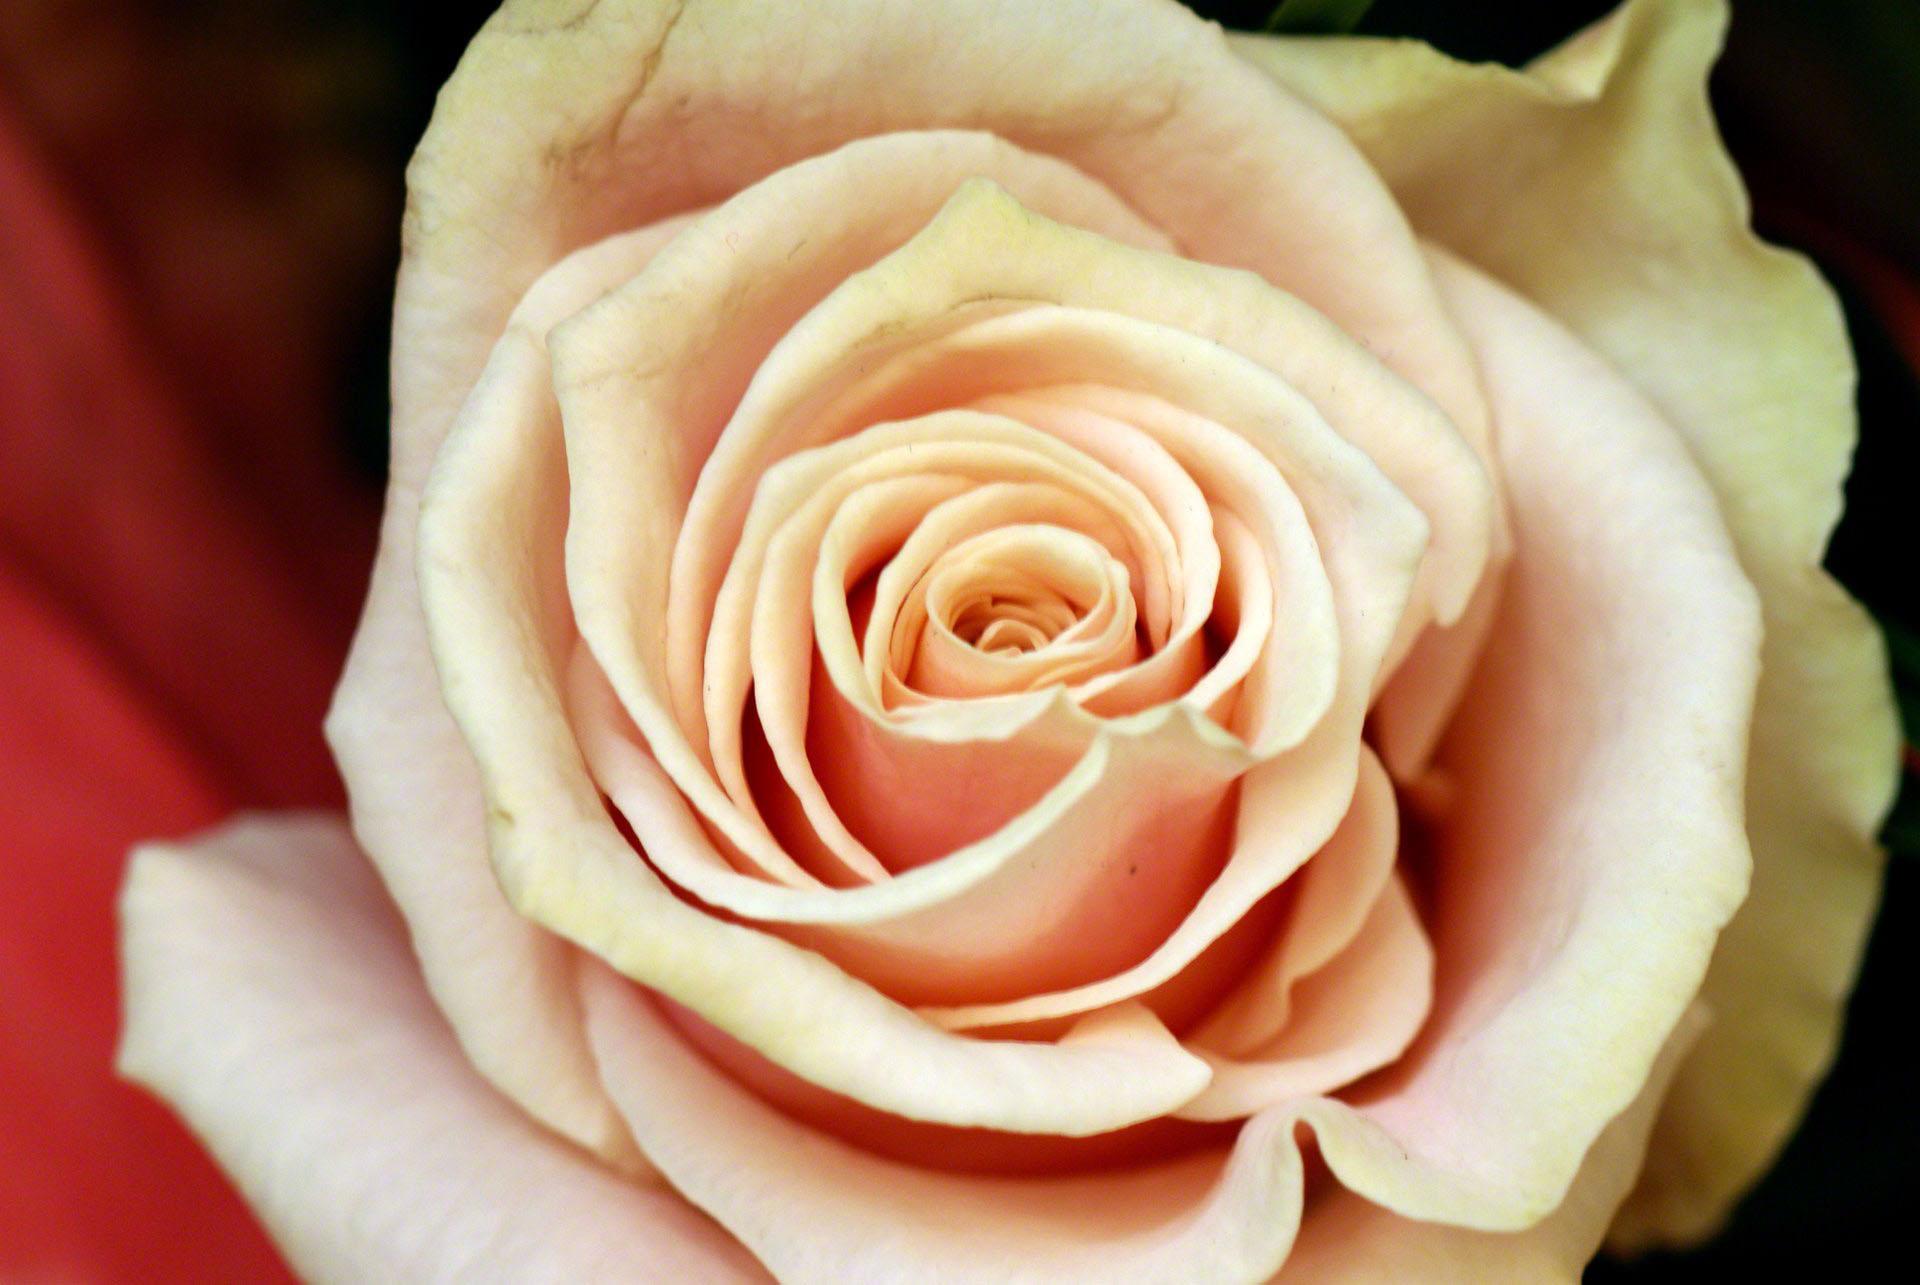 http://www.fabiovisentin.com/photography/photo/12/peach-rose-00756.jpg